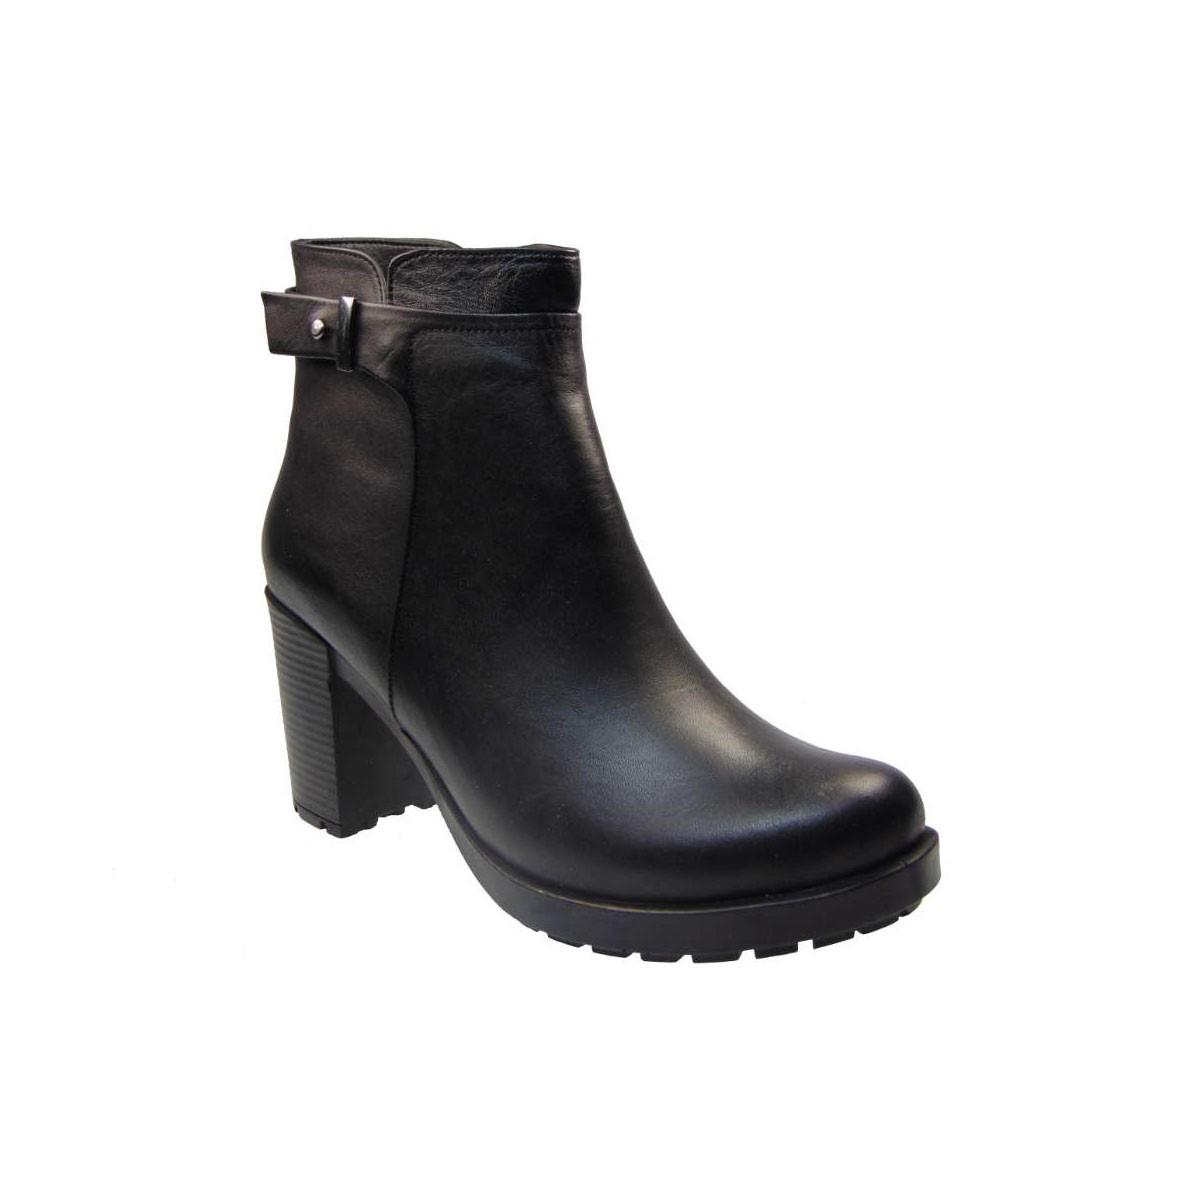 23cd339c722 Παπούτσια TsimpolisShoes Γυναικεία   My Lady Shoes